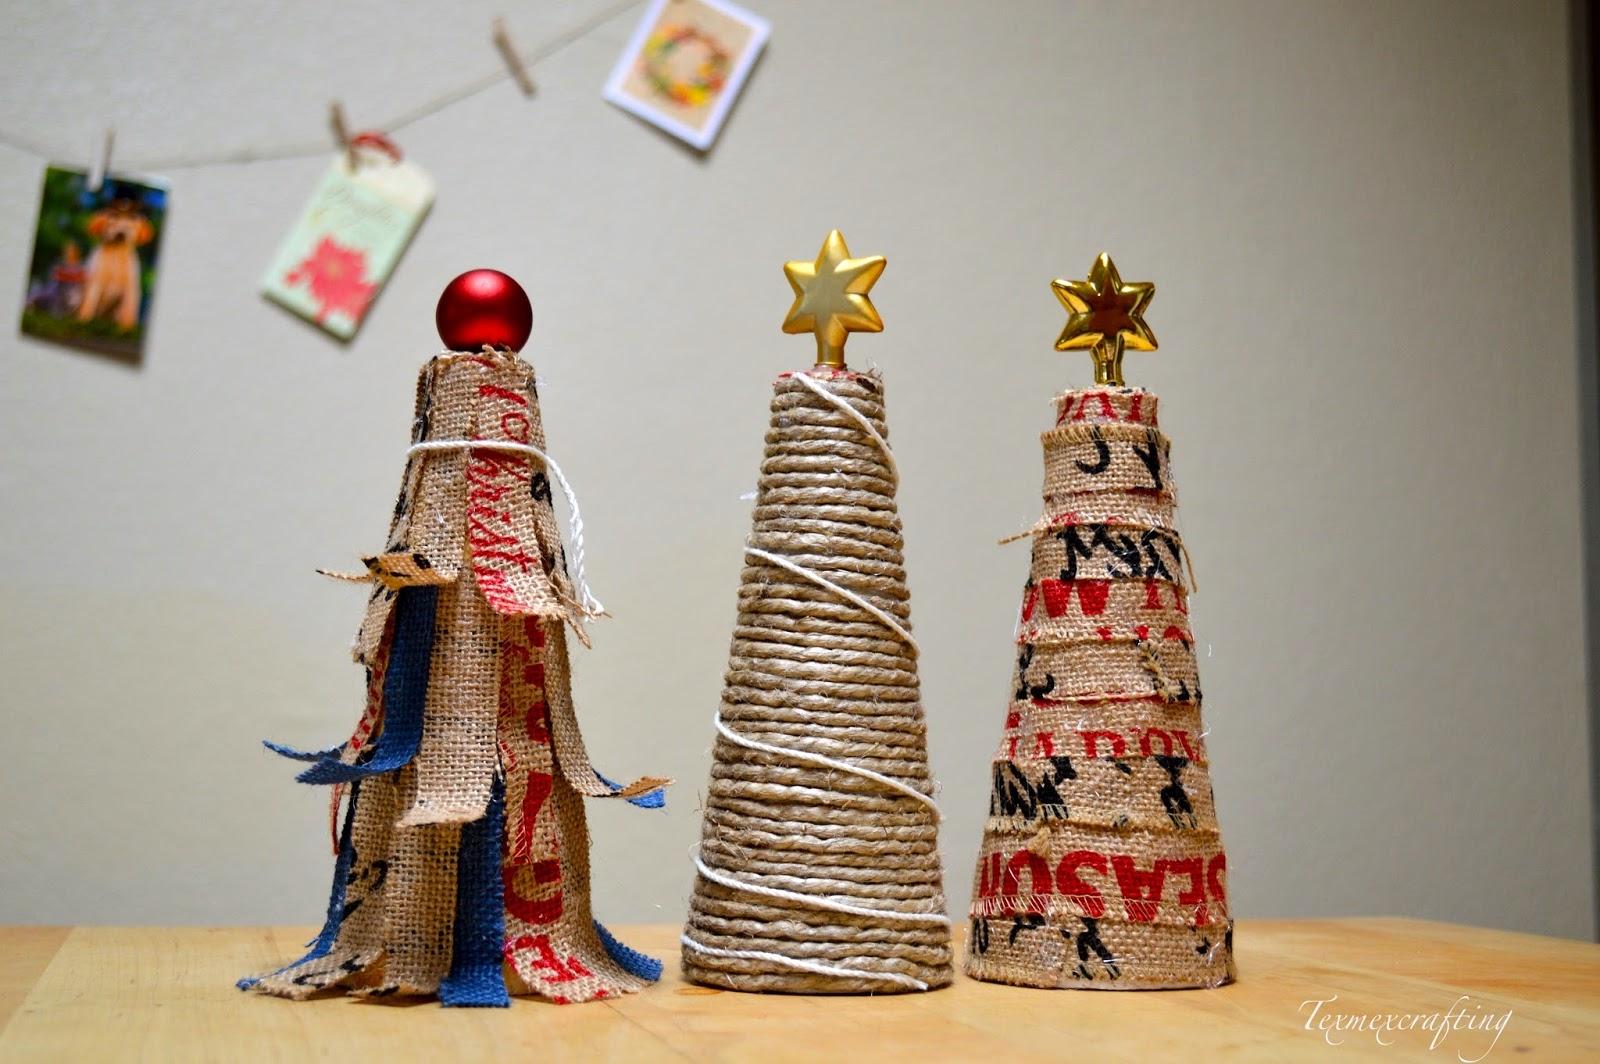 http://www.texmexcrafting.com/2014/12/diy-decorative-trees.html